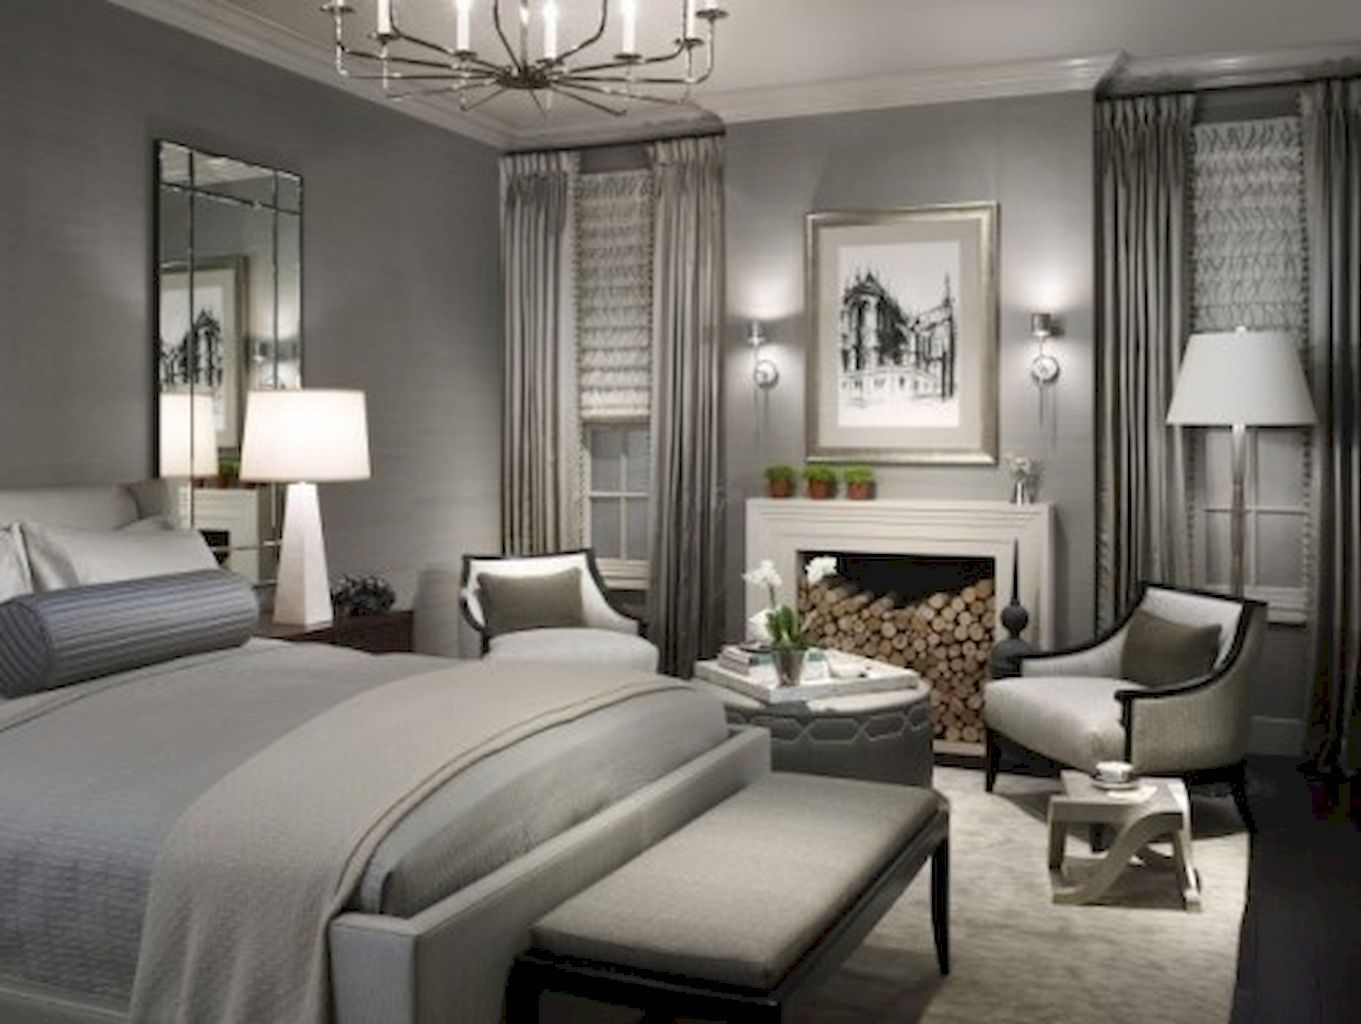 60 Romantic Master Bedroom Decor Ideas